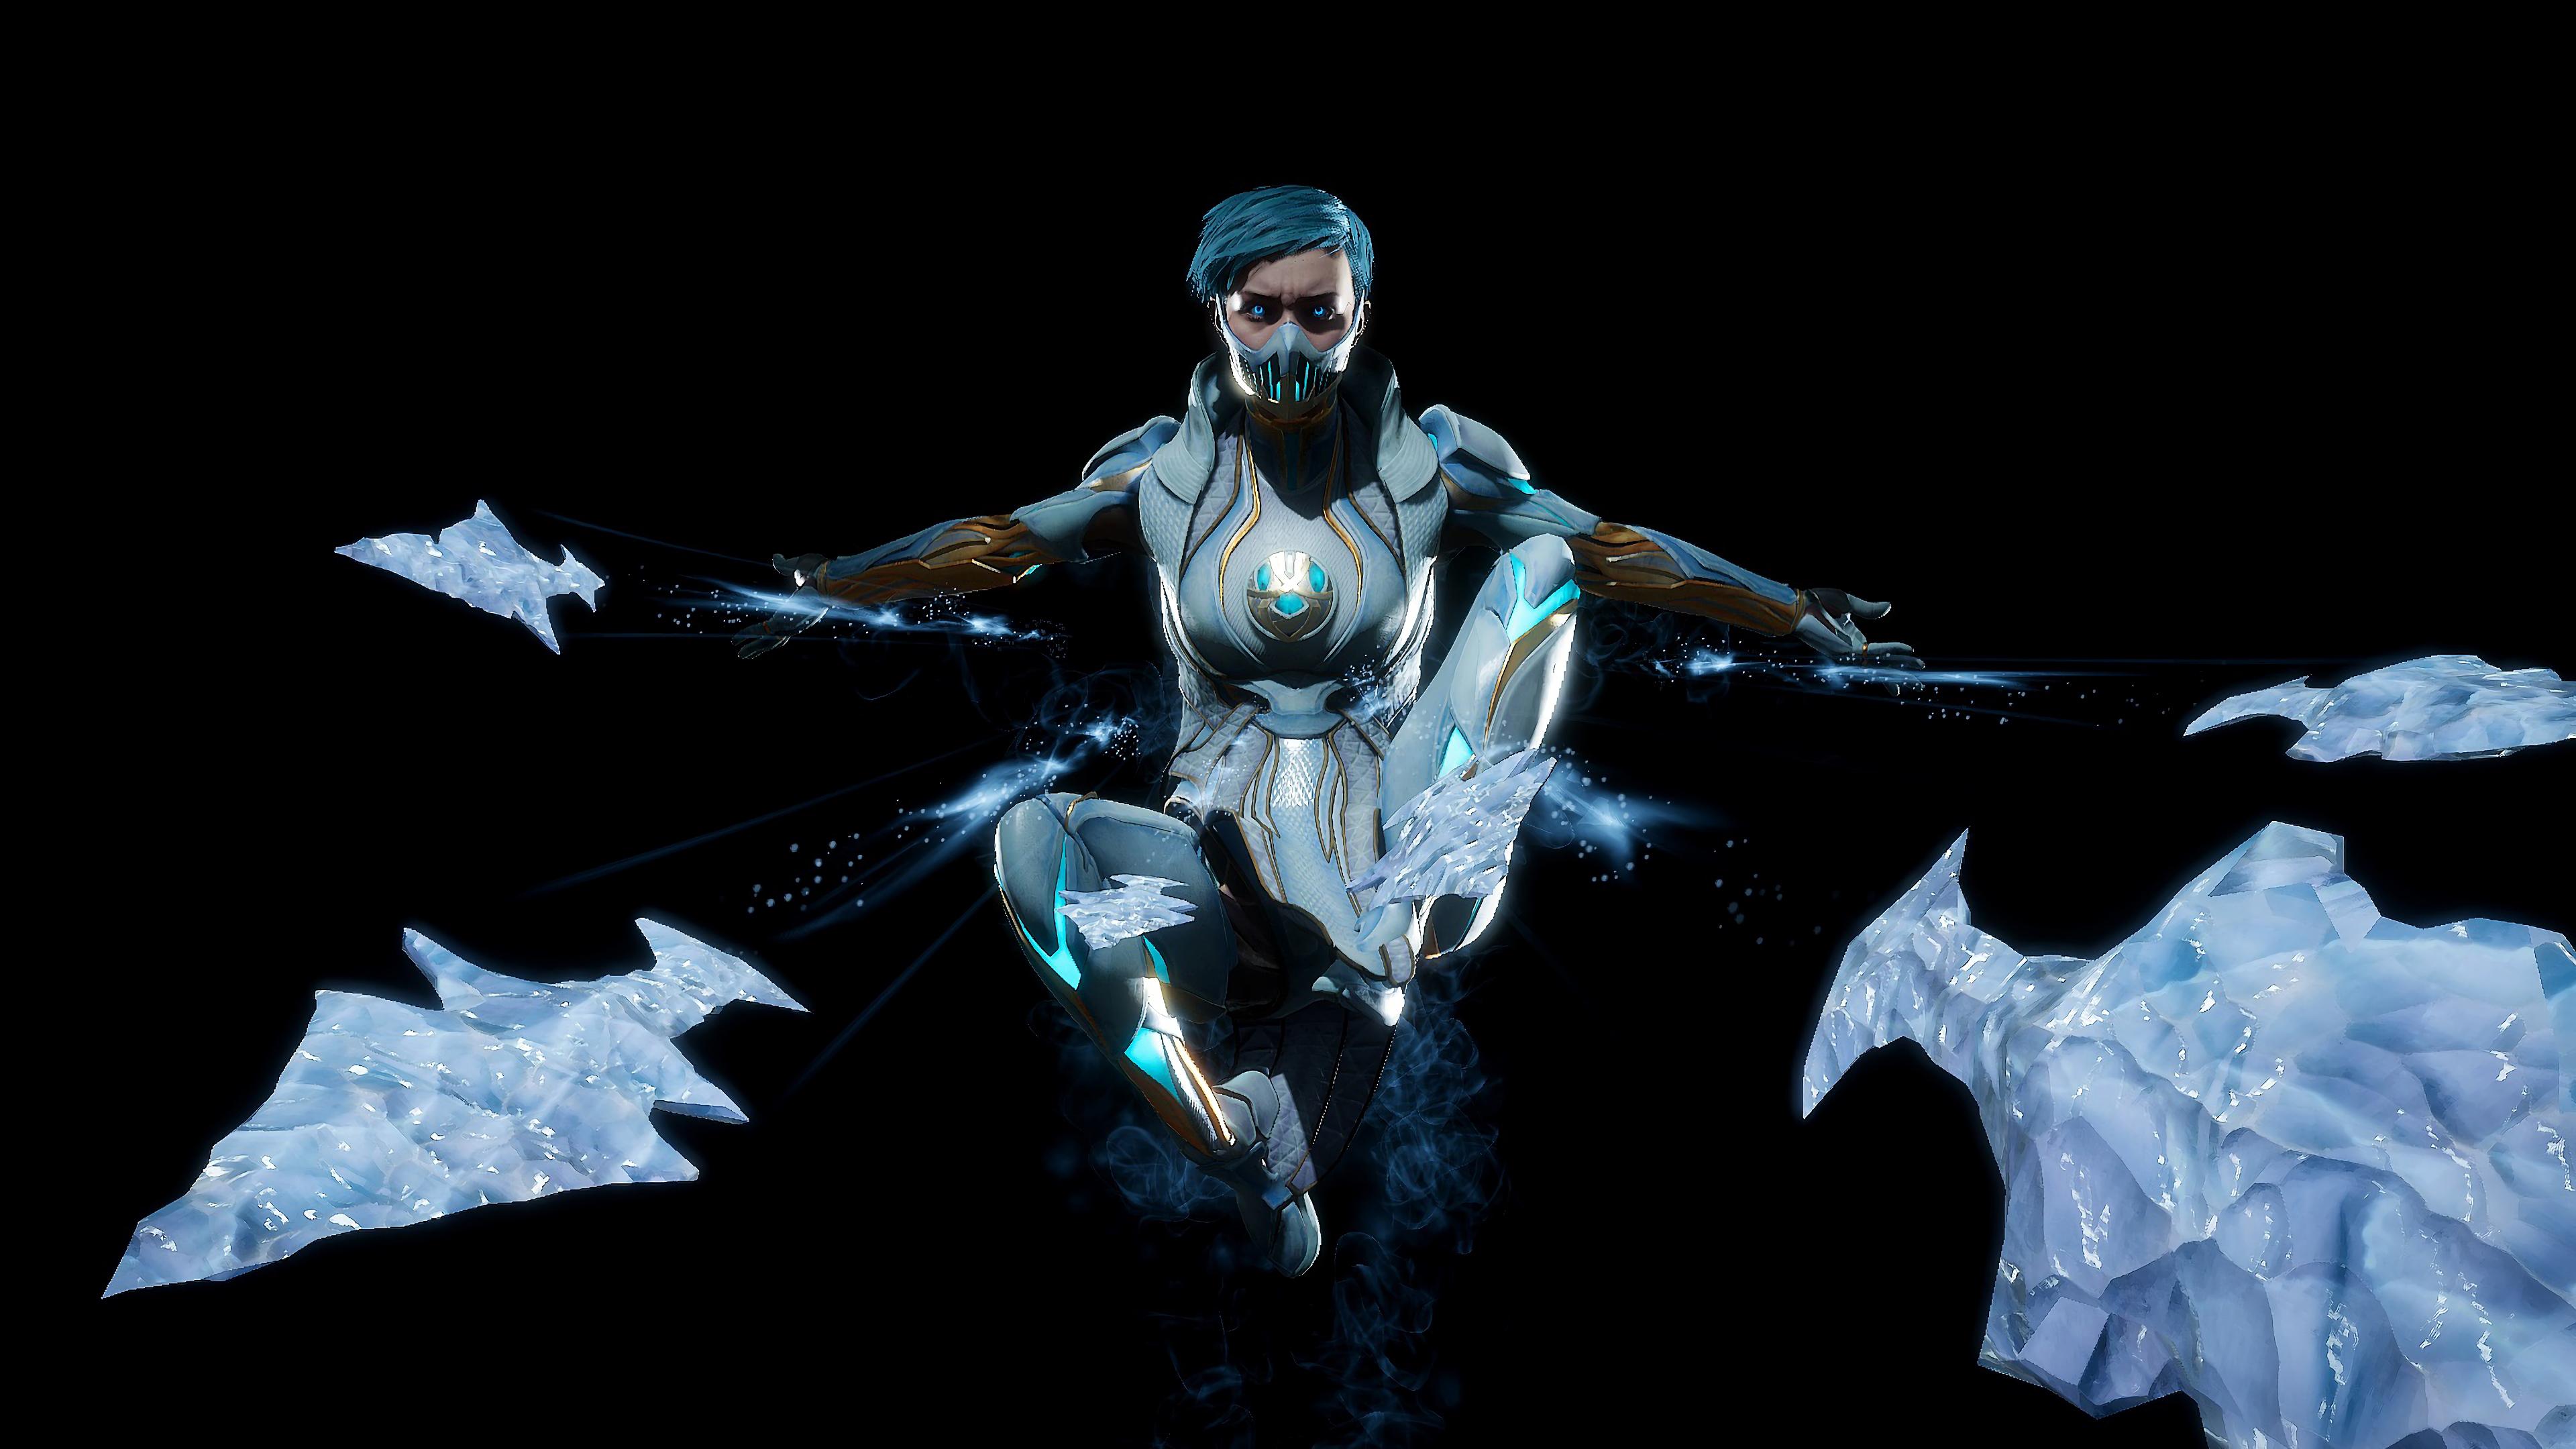 Frost, Mortal Kombat 11, 4K, #218 Wallpaper